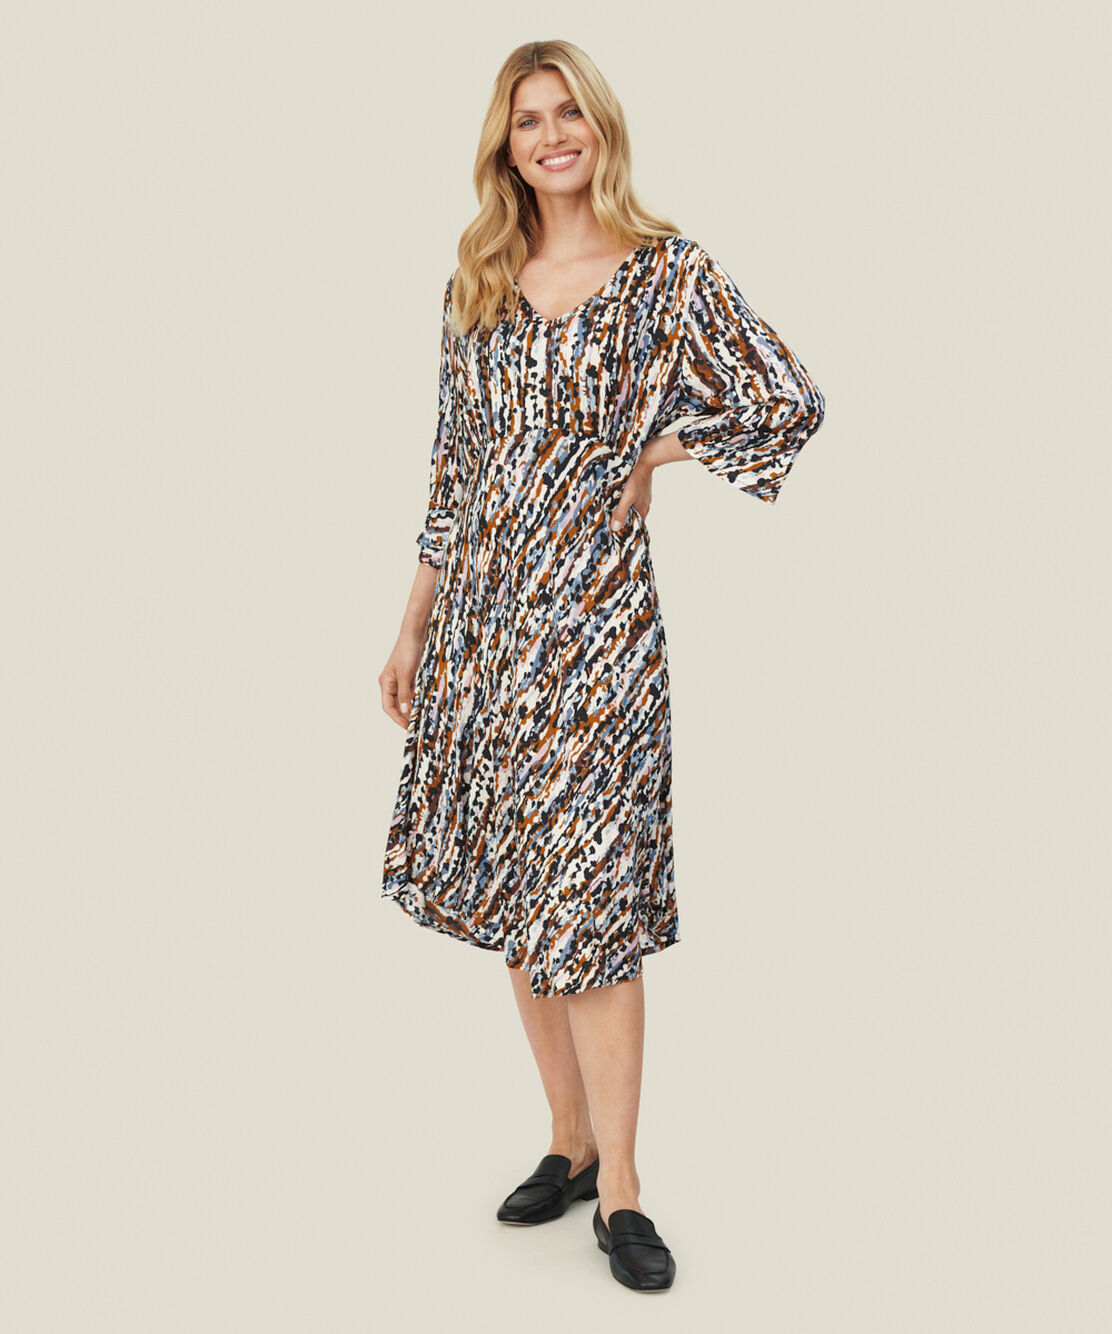 NITA DRESS, Vintage, hi-res